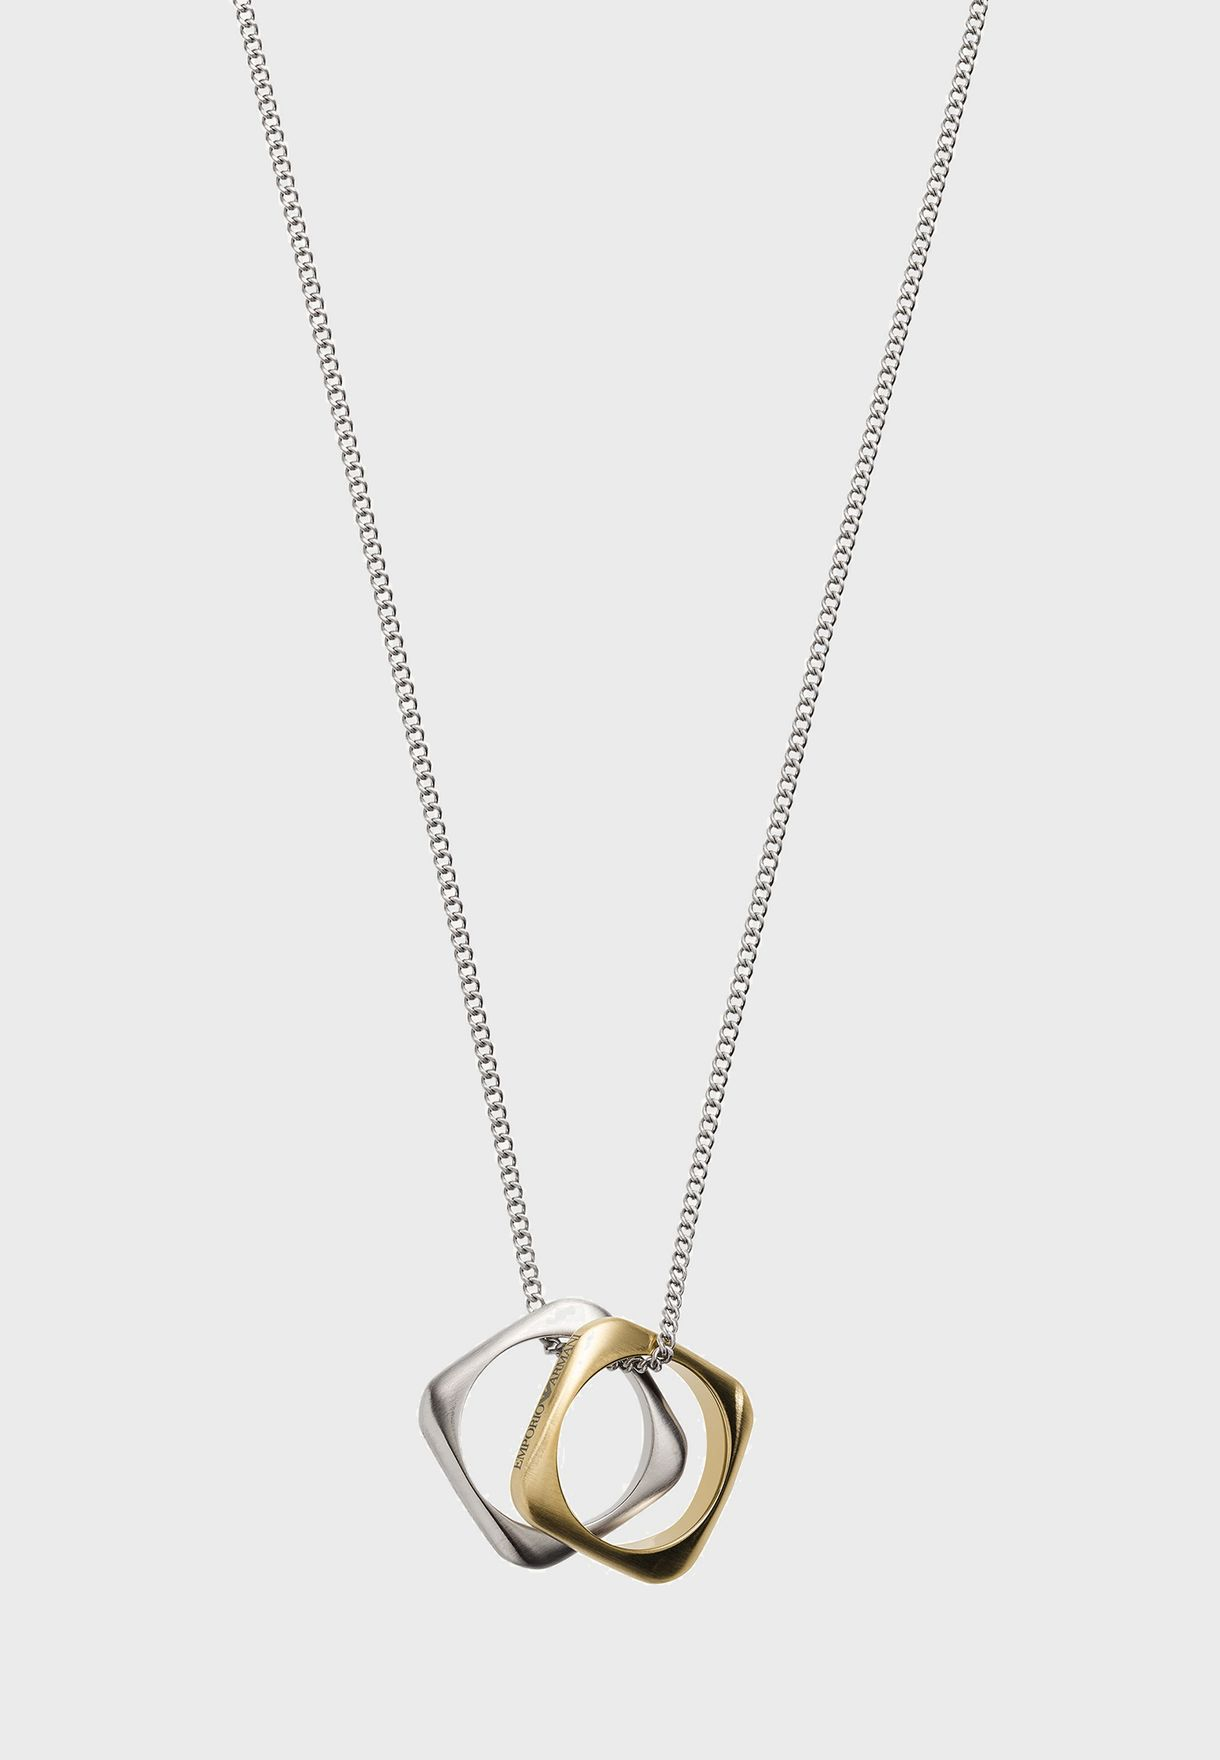 EGS2709040 Steel Pendant Necklace